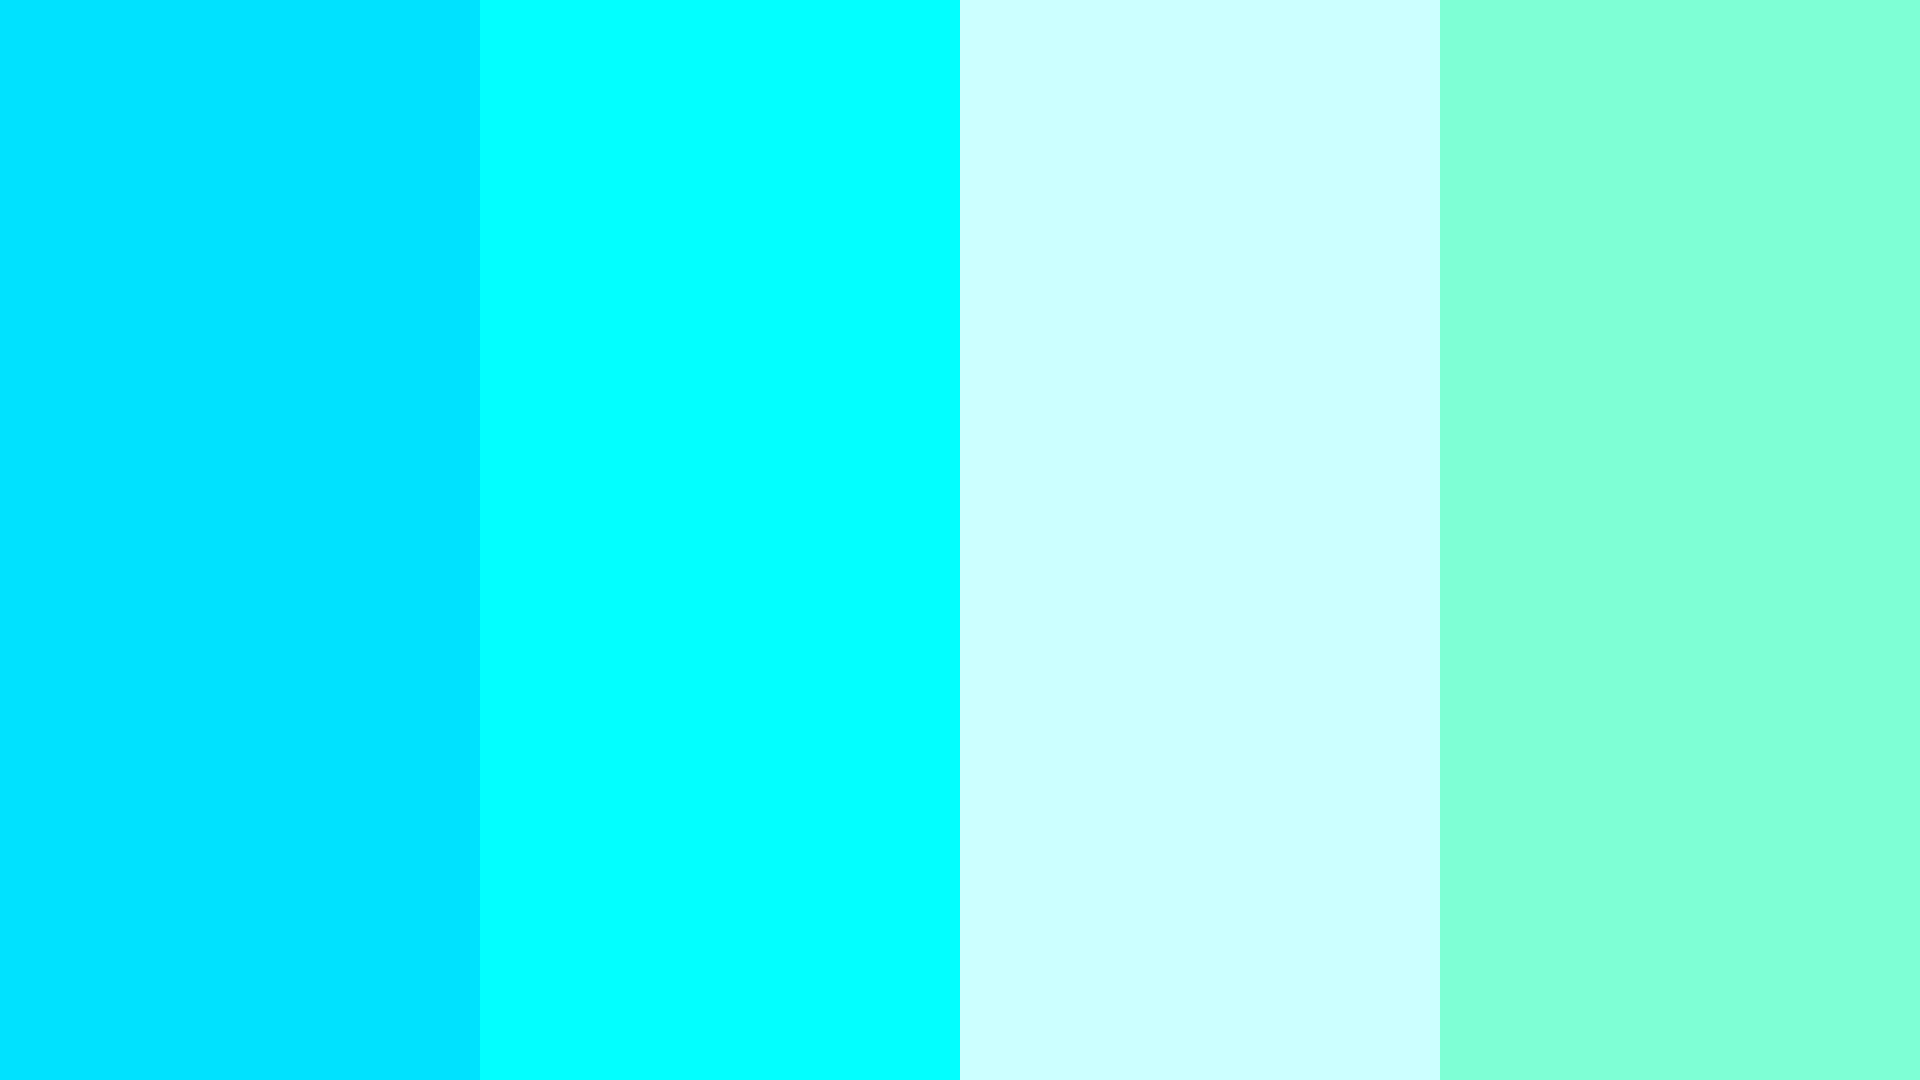 Play With Aqua Color Palette In 2020 Aqua Color Palette Aqua Color Color Palette